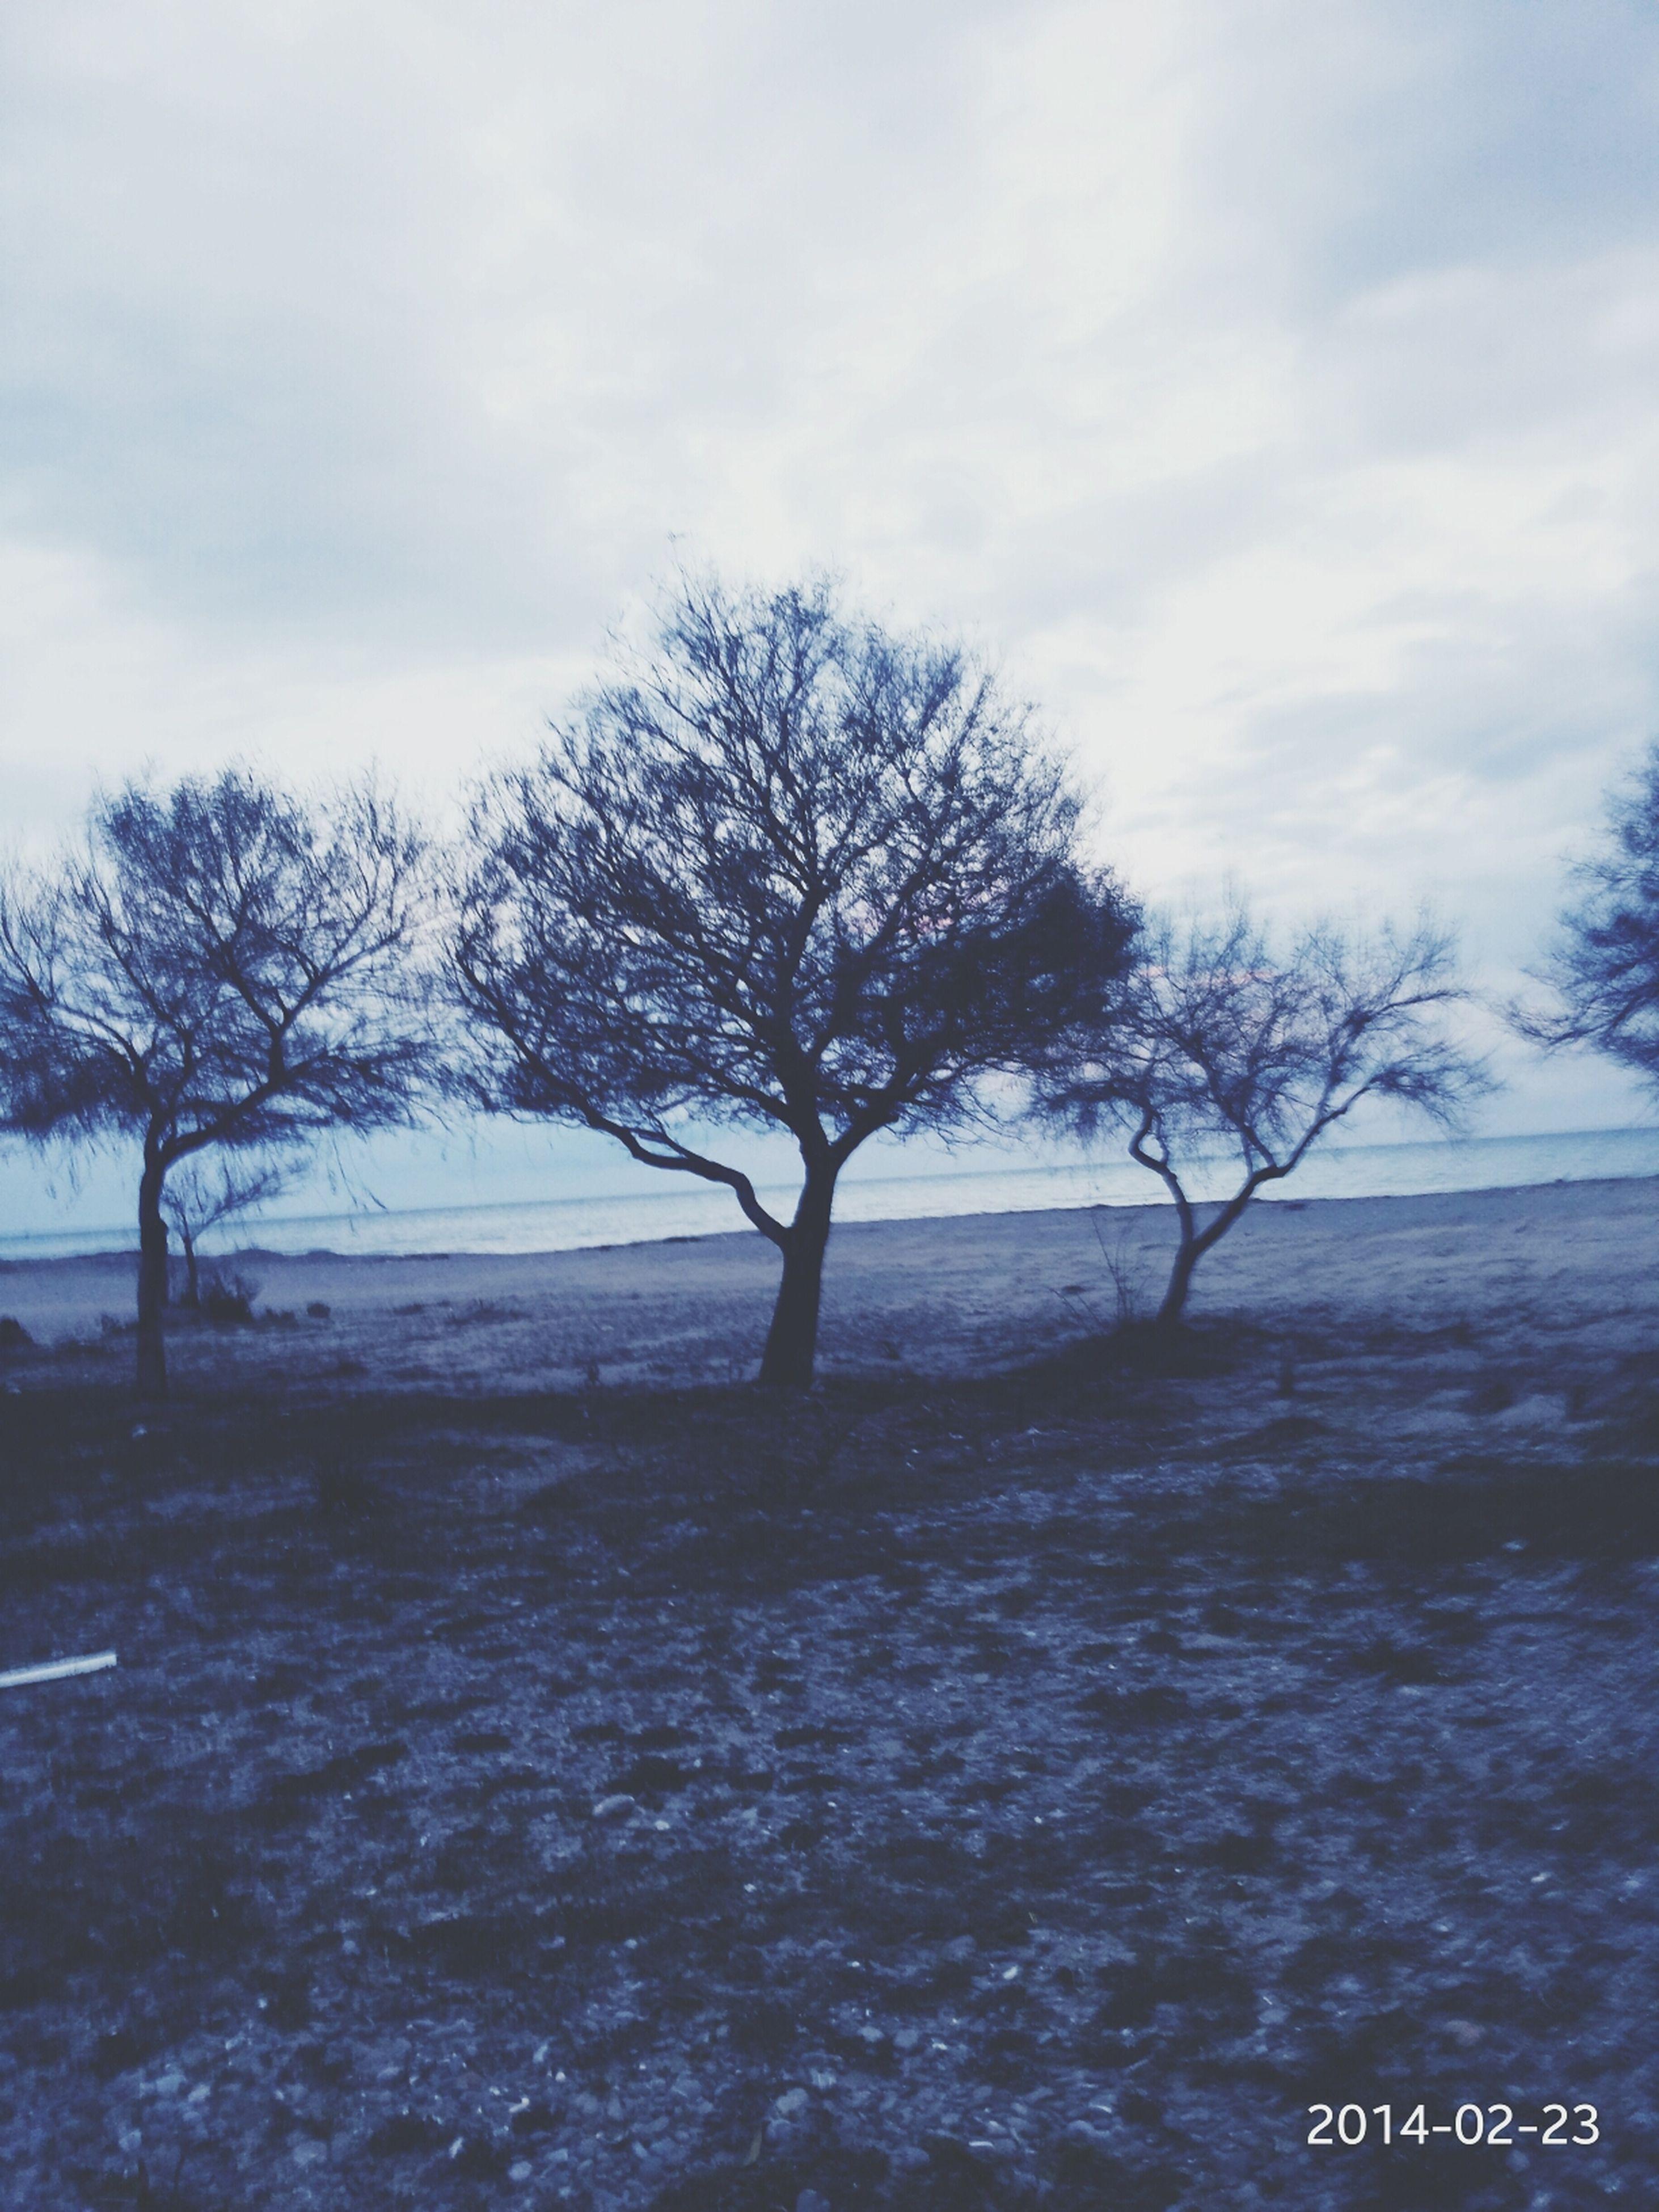 winter, snow, cold temperature, bare tree, tree, tranquility, tranquil scene, weather, sky, season, scenics, beauty in nature, nature, landscape, branch, cloud - sky, covering, field, frozen, non-urban scene